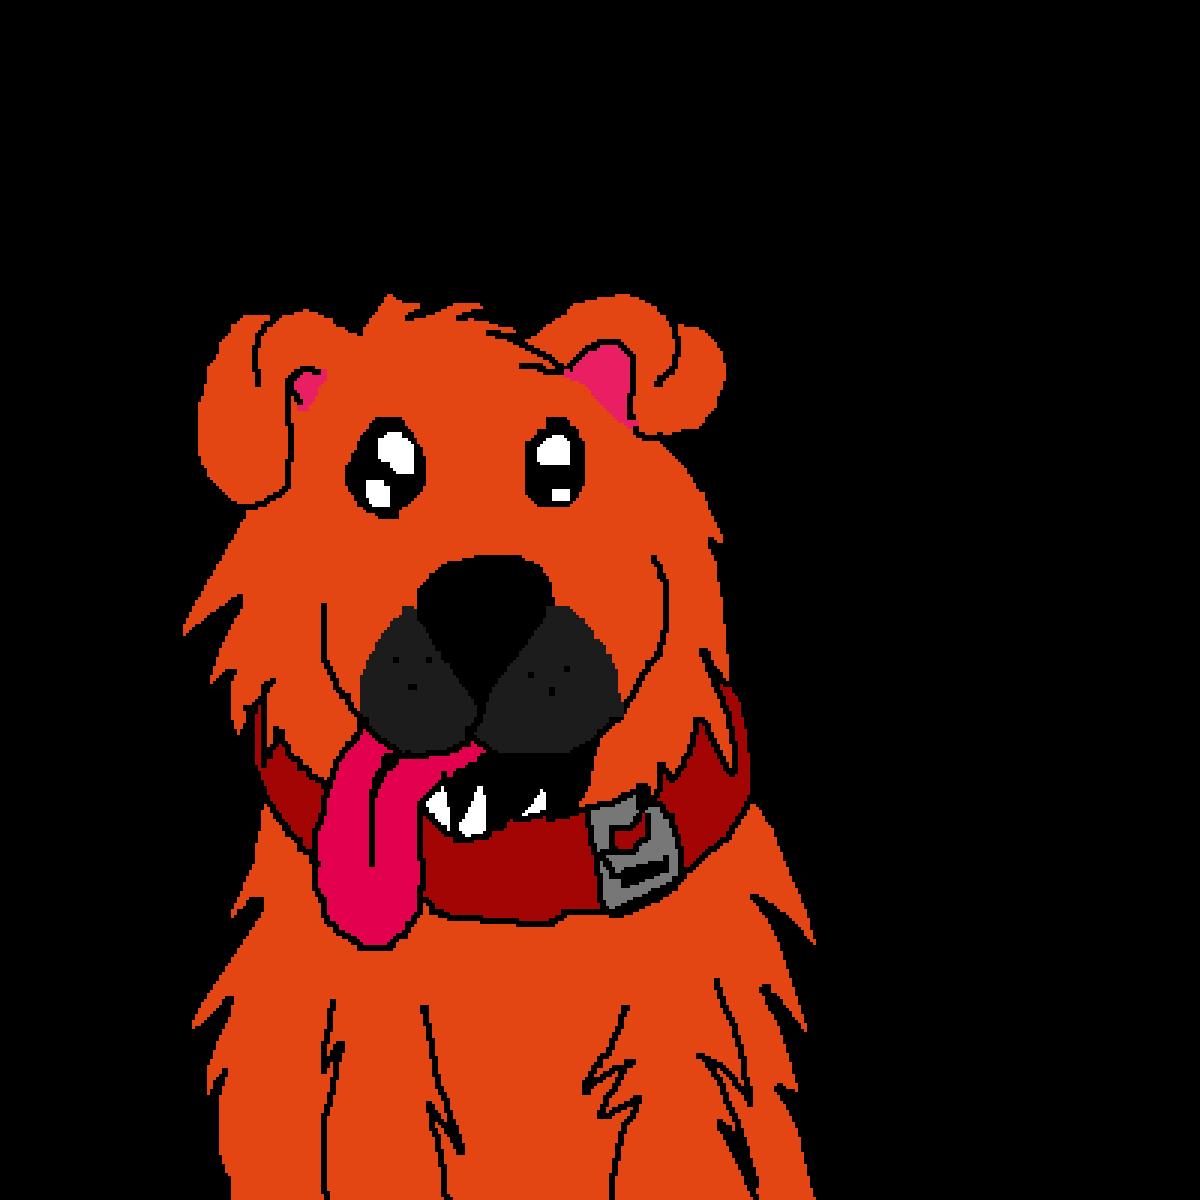 main-image-doggo  by GhostTheDog